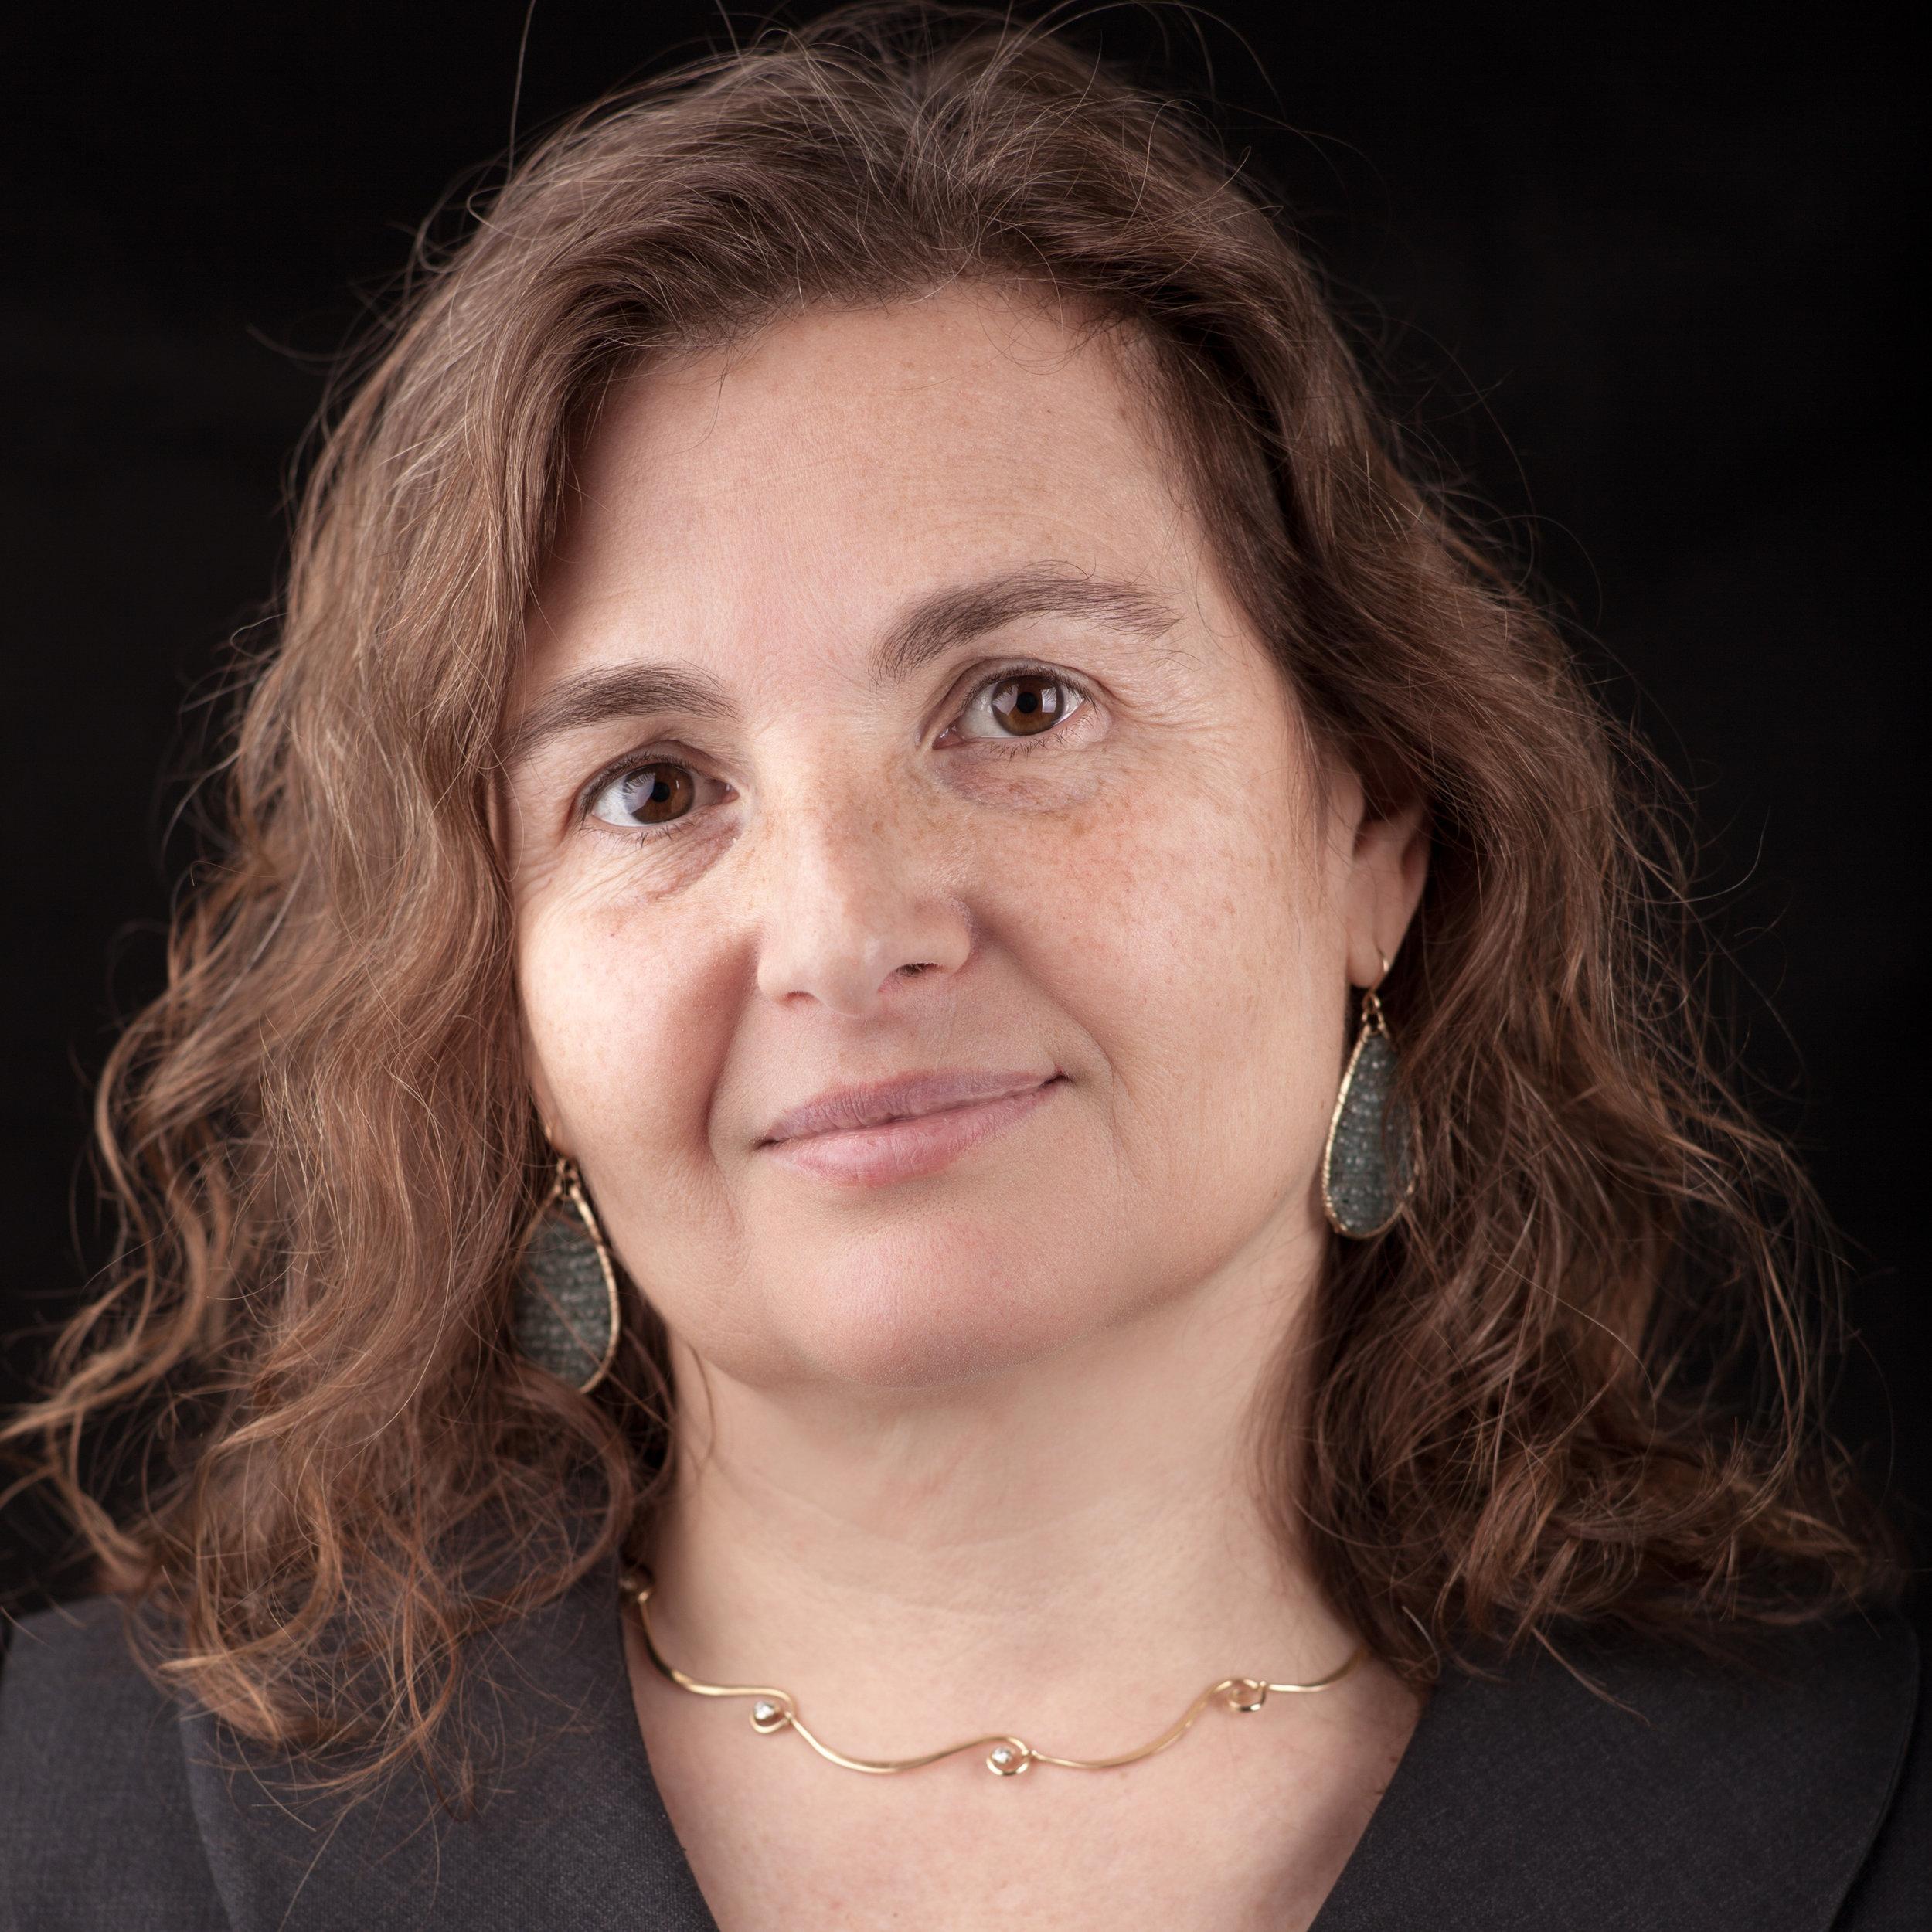 Daniela Rus